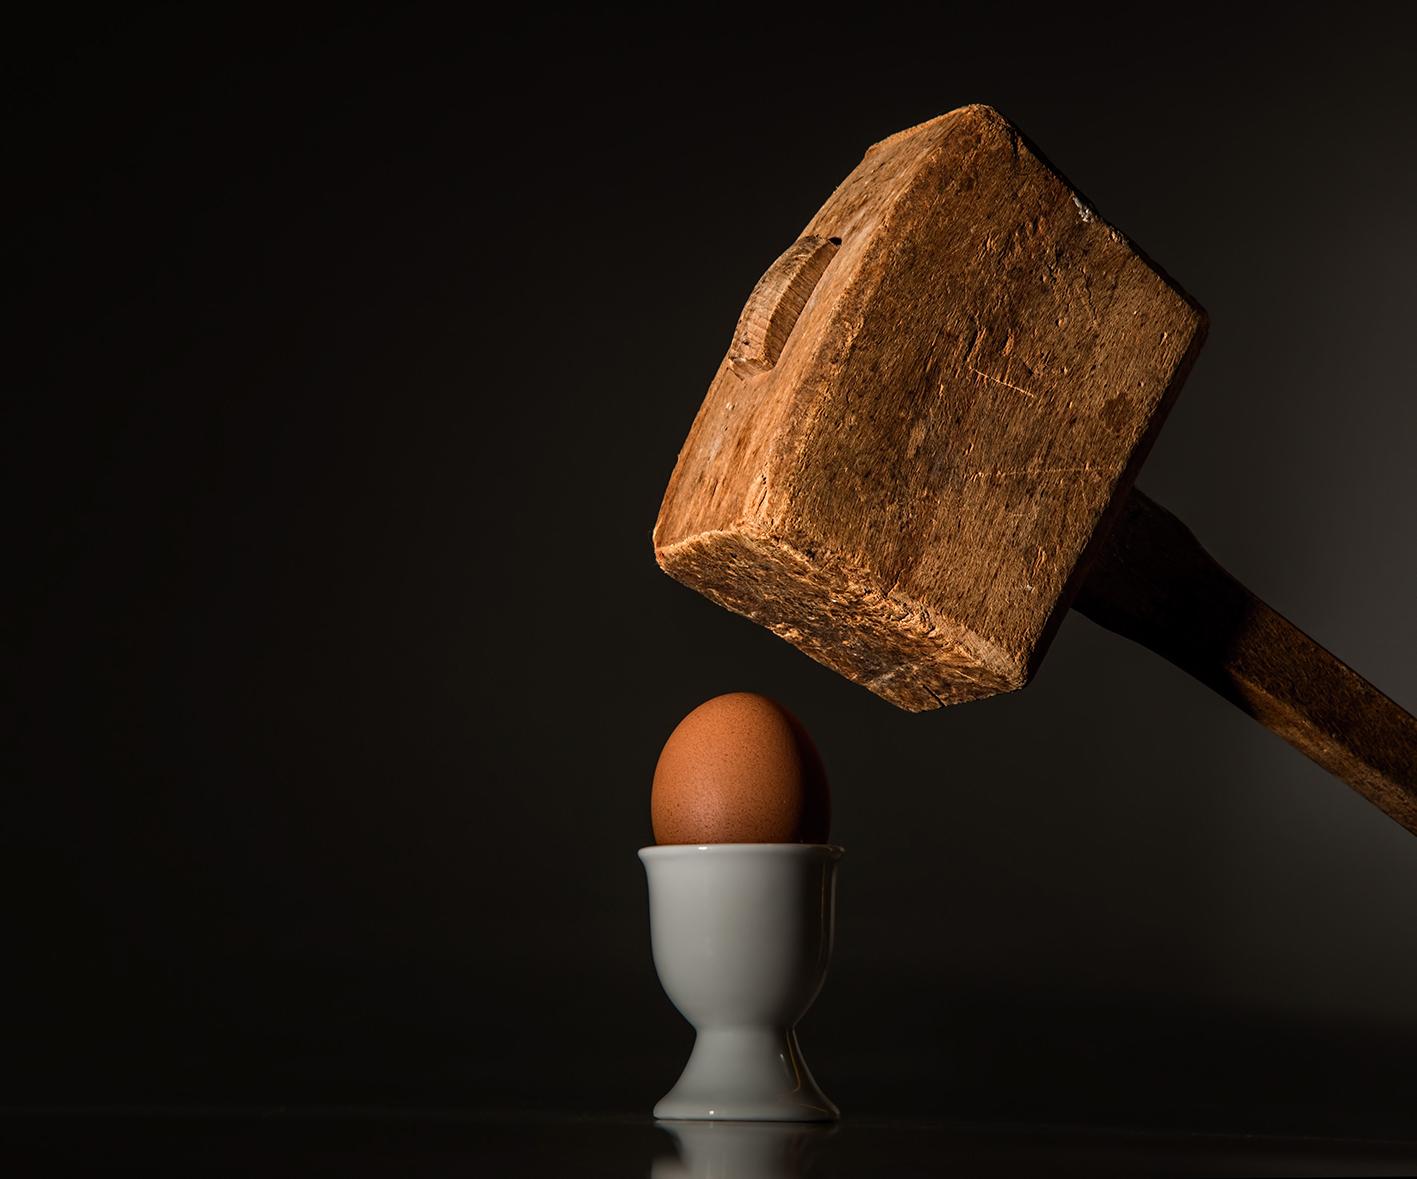 sloophamer boven een gekookt eitje